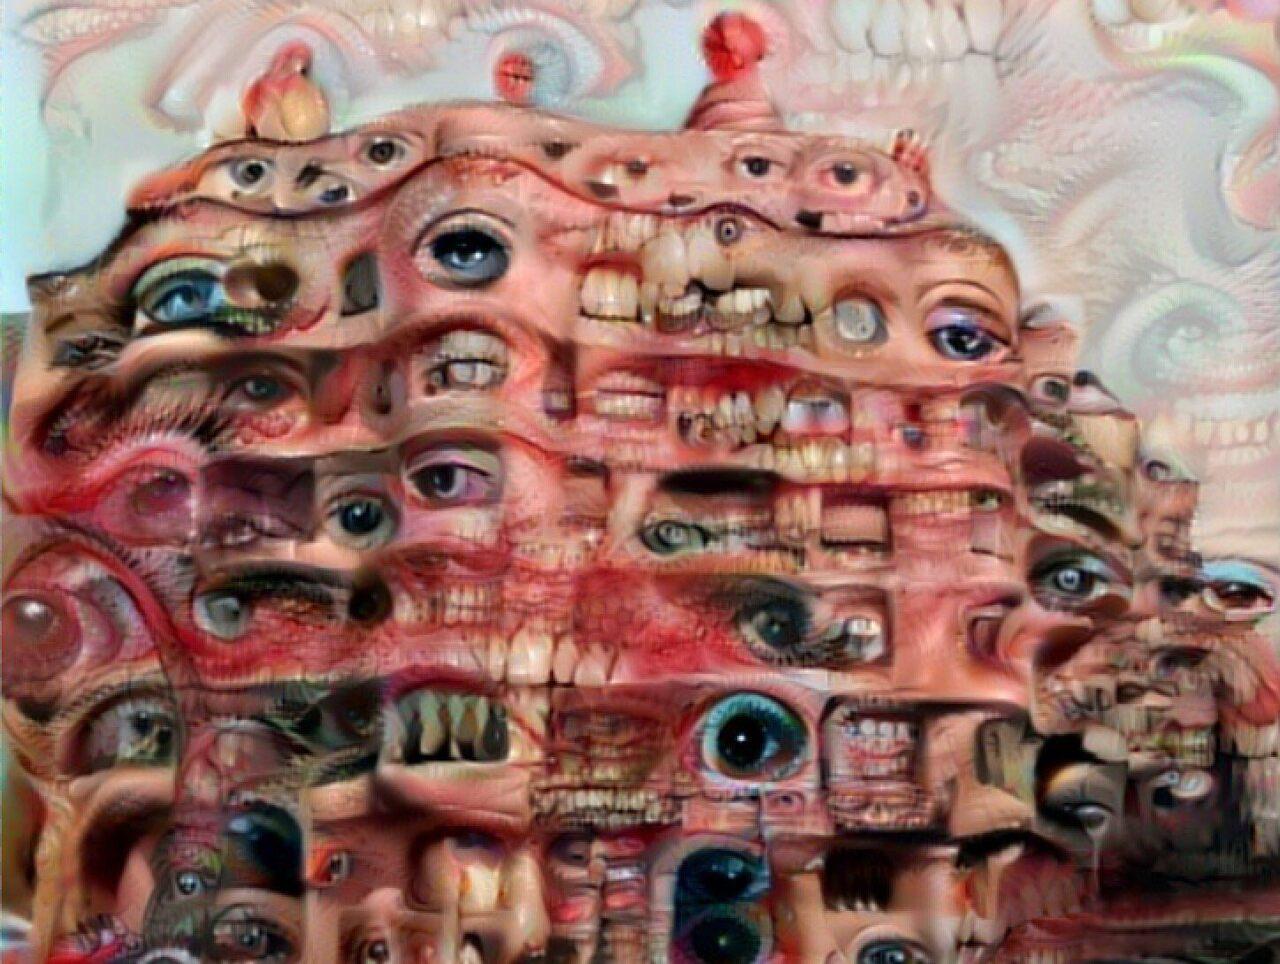 Algohorror The Creepy Visual Mash Up Art Created With Algorithms